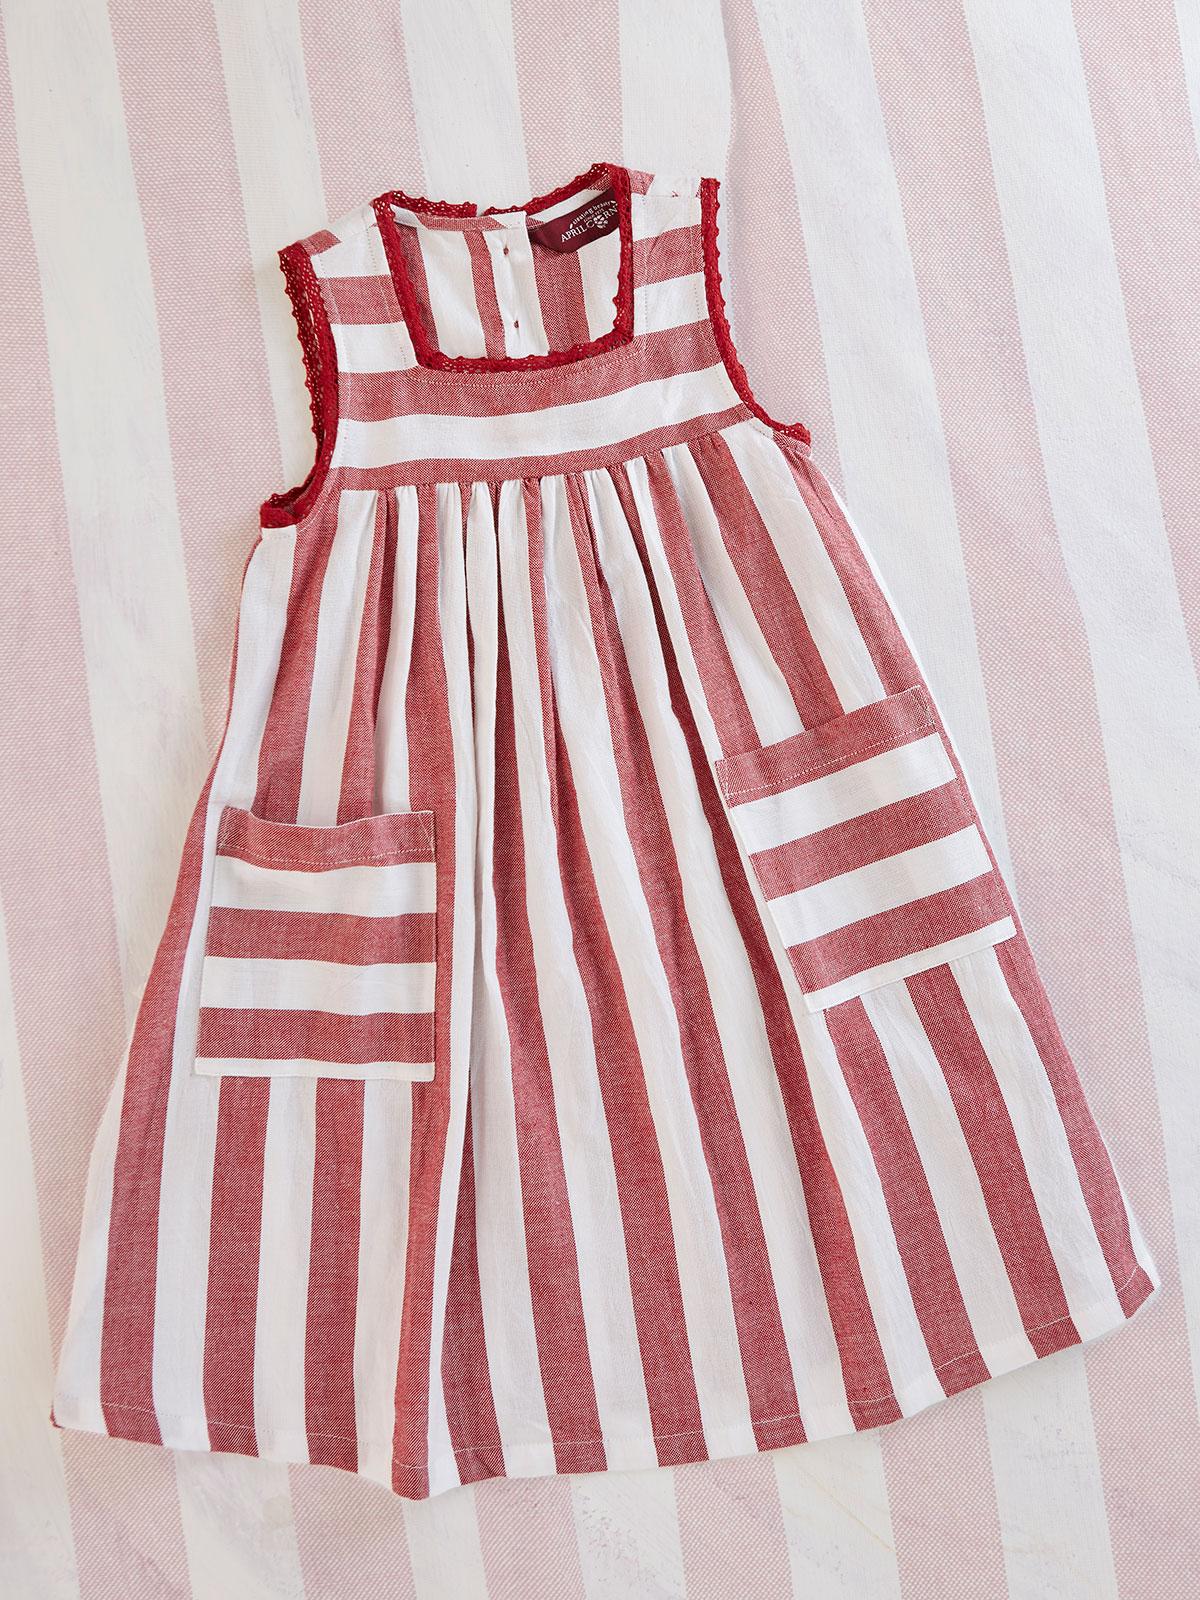 Nantucket Stripe Girls Dress